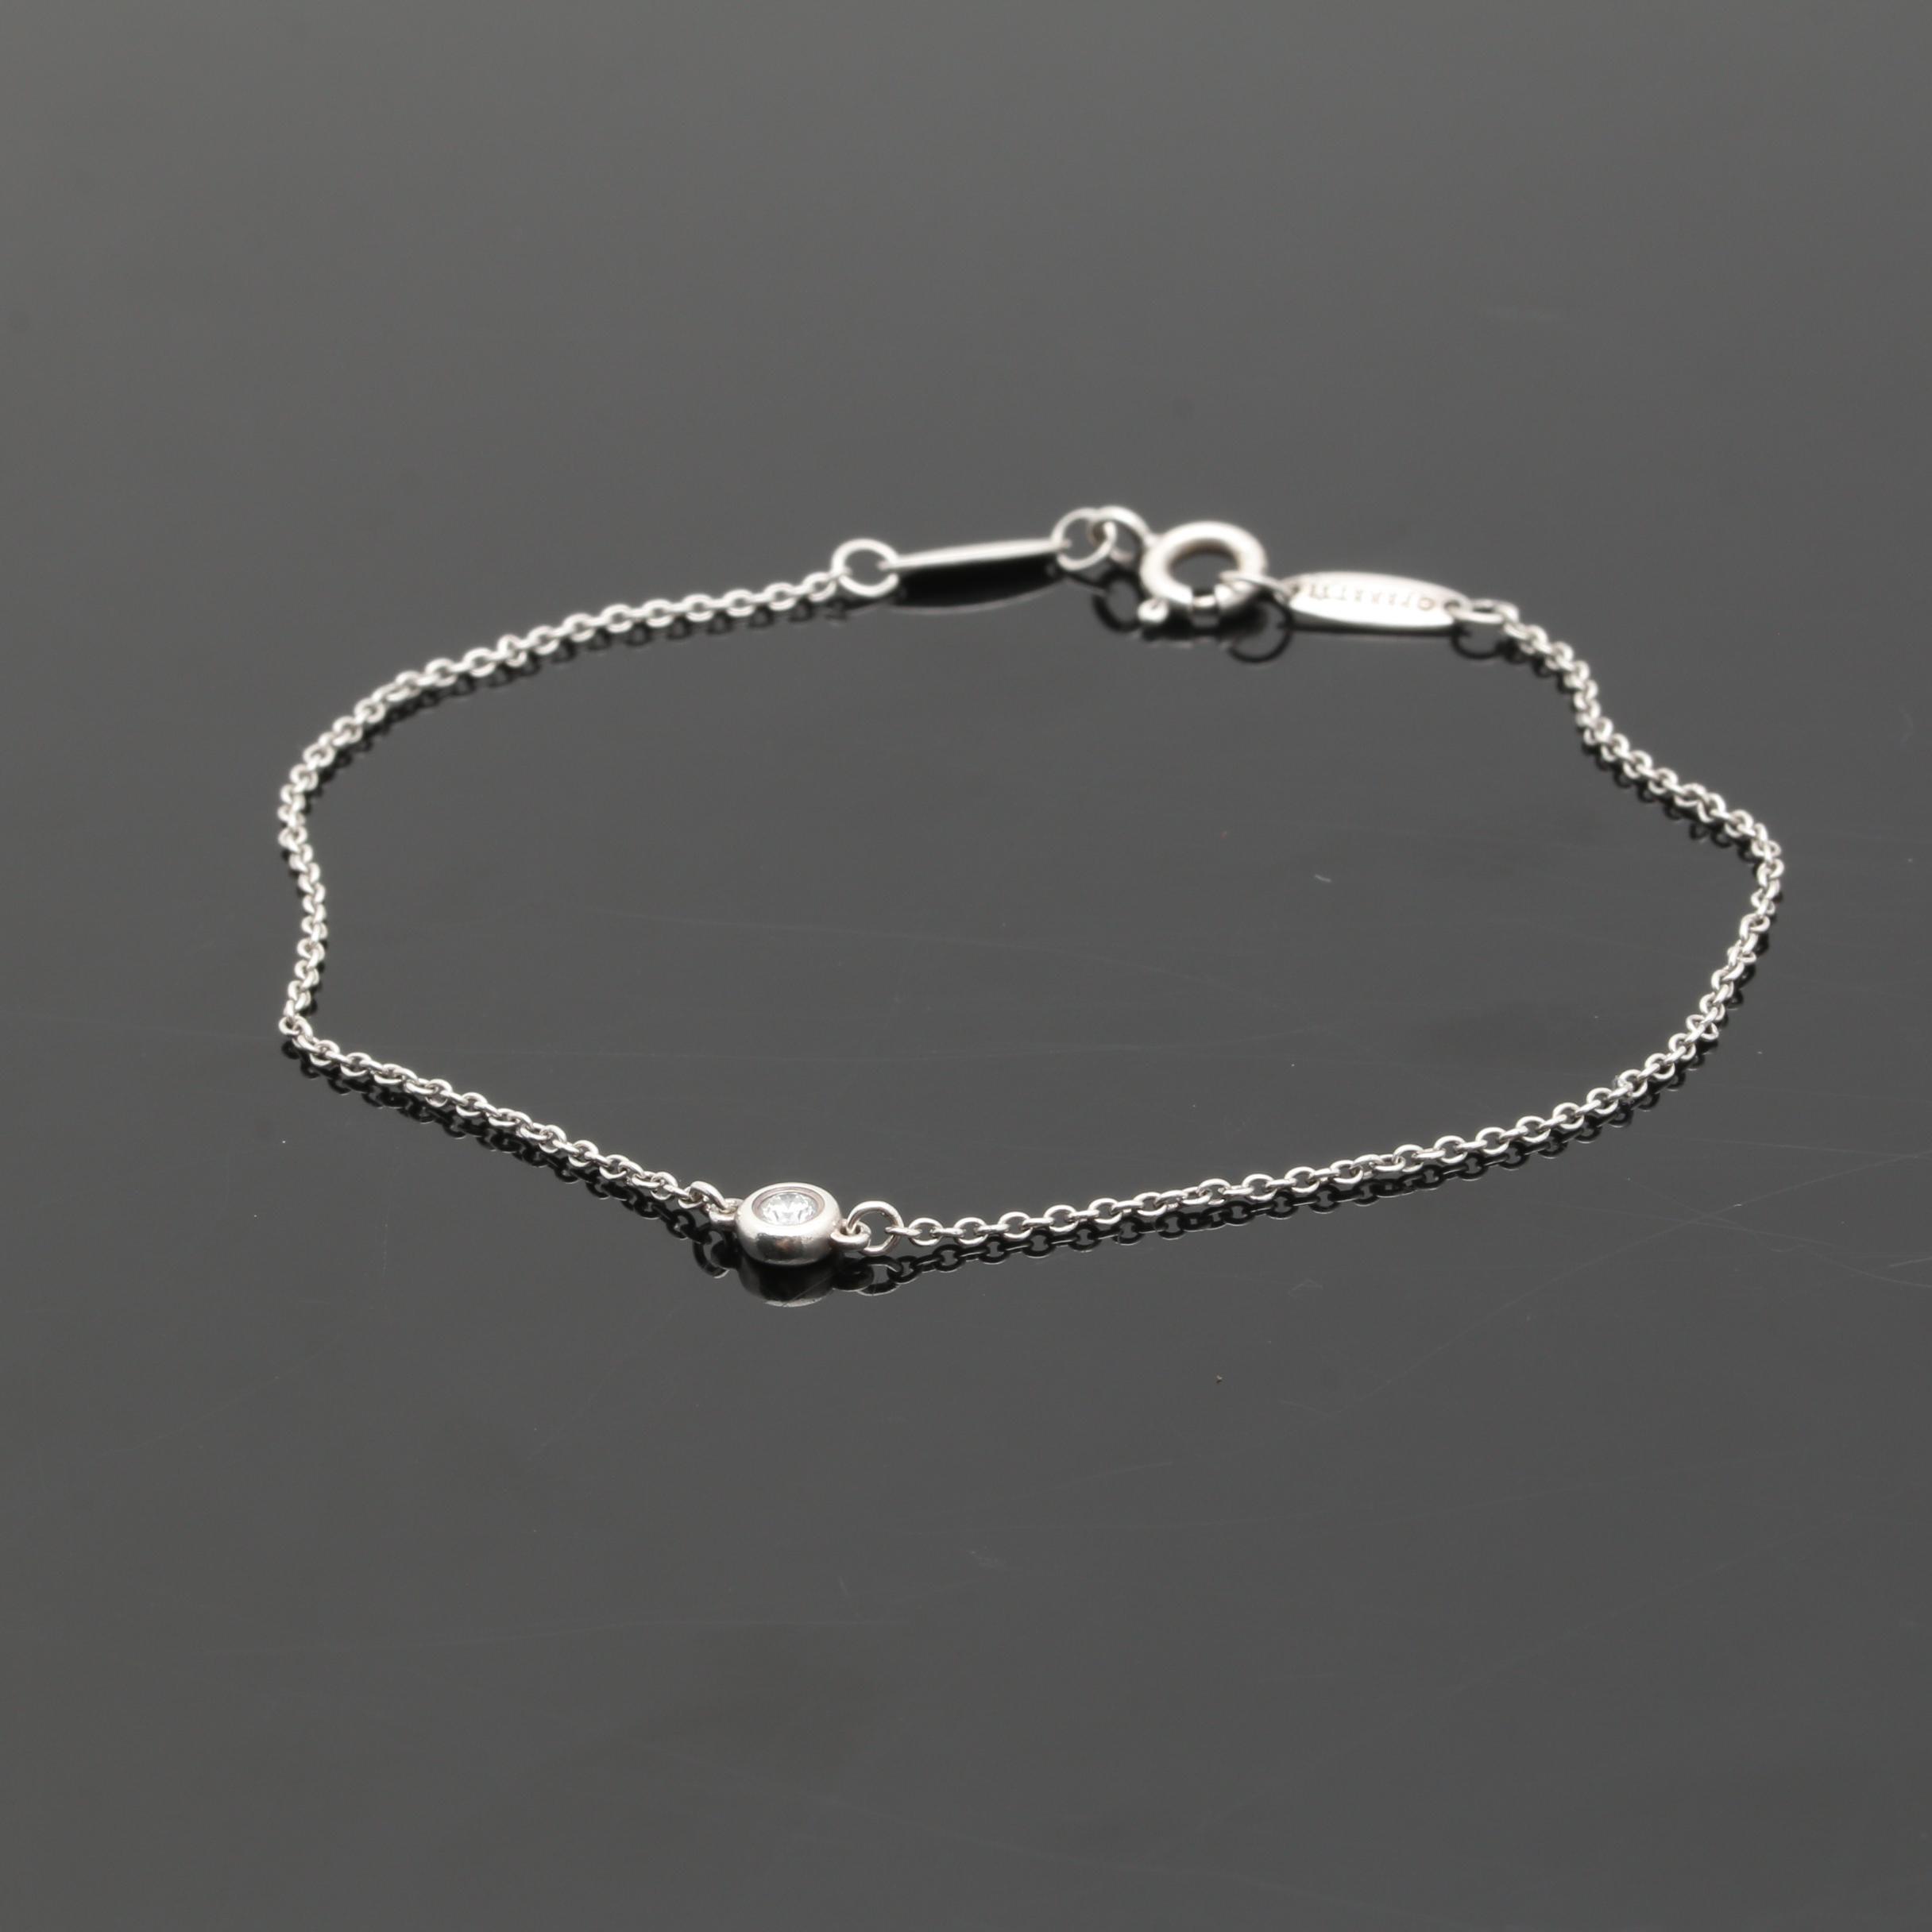 Elsa Peretti for Tiffany & Co. Sterling Silver Diamond Bracelet